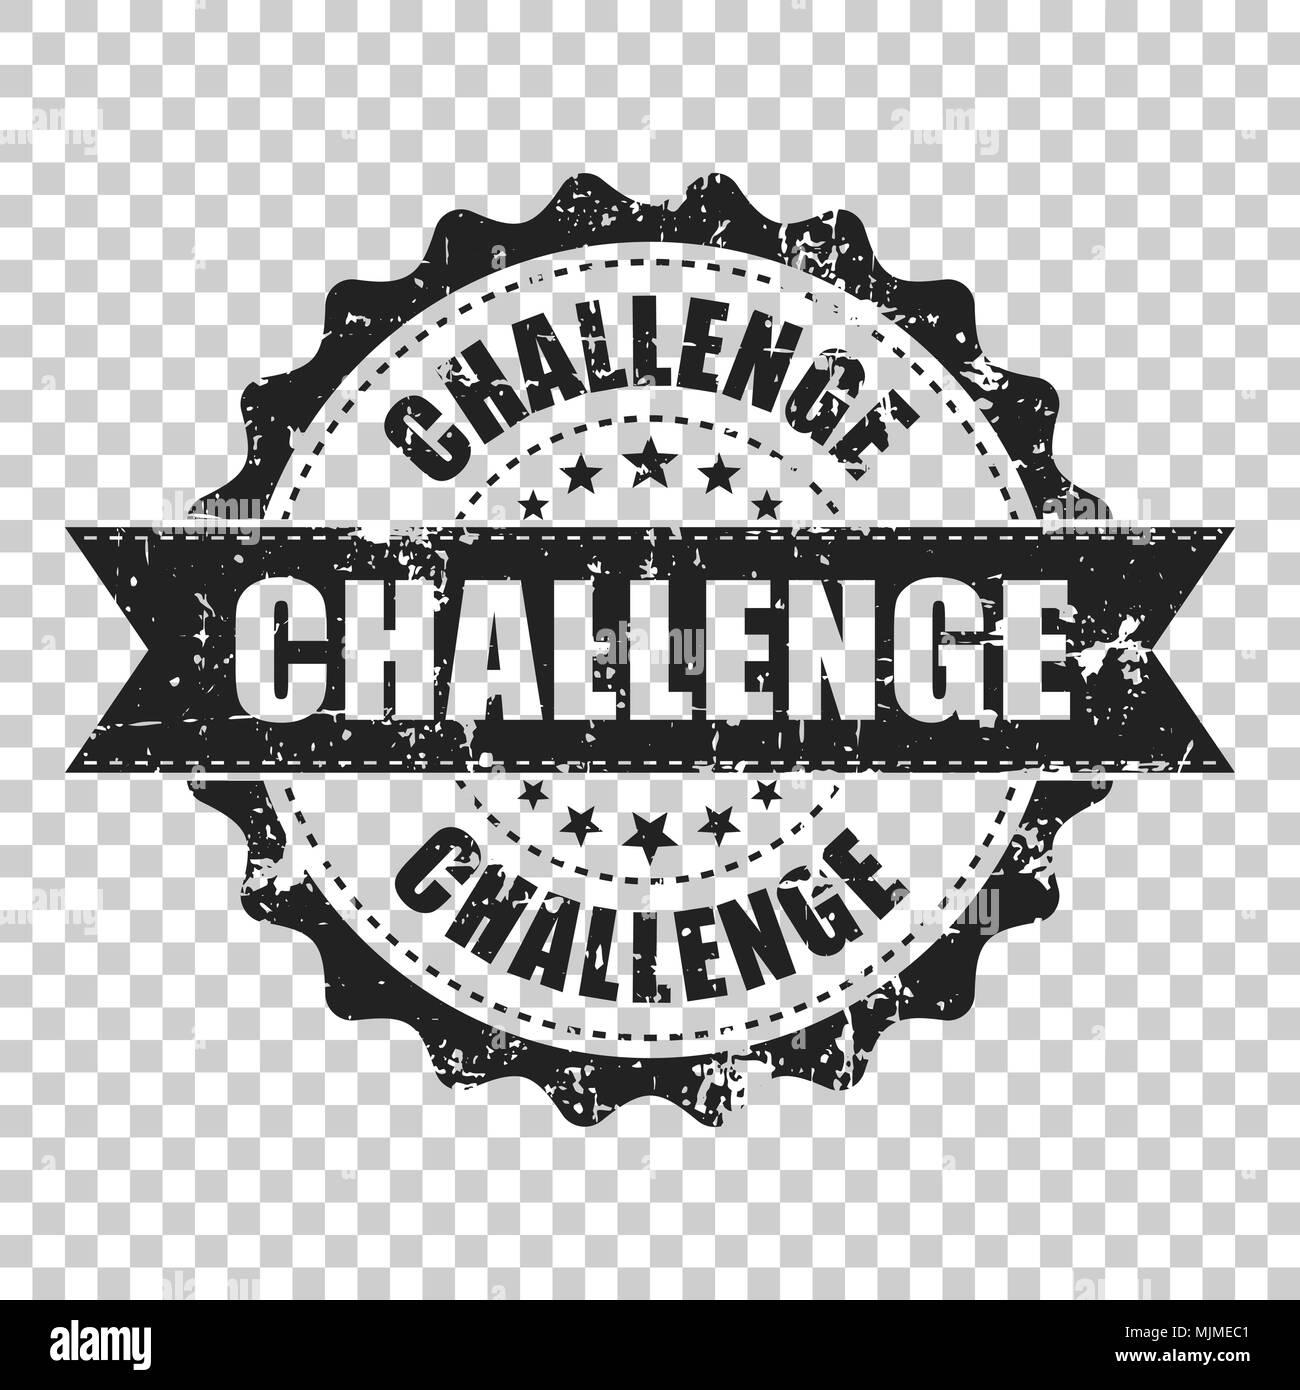 Challenge Scratch Grunge Rubber Stamp Vector Illustration On Isolated Transparent Background Business Concept Pictogram